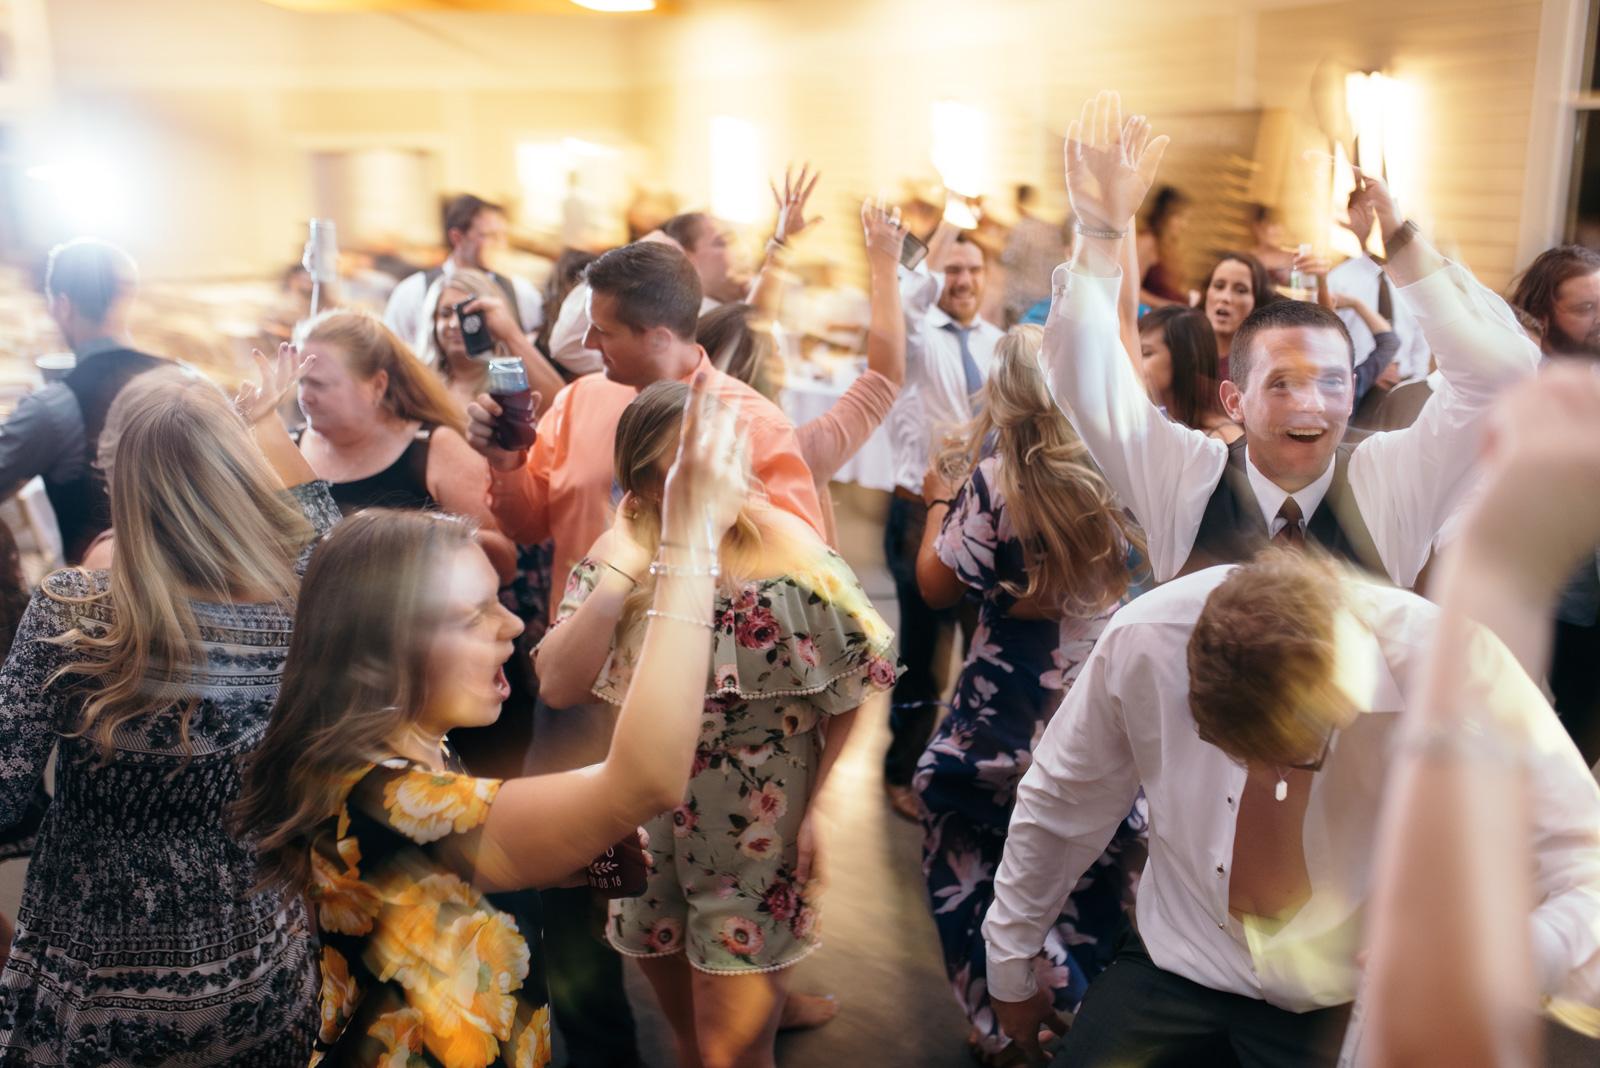 wedding guests dancing Ushers Ferry Historic Village wedding venue